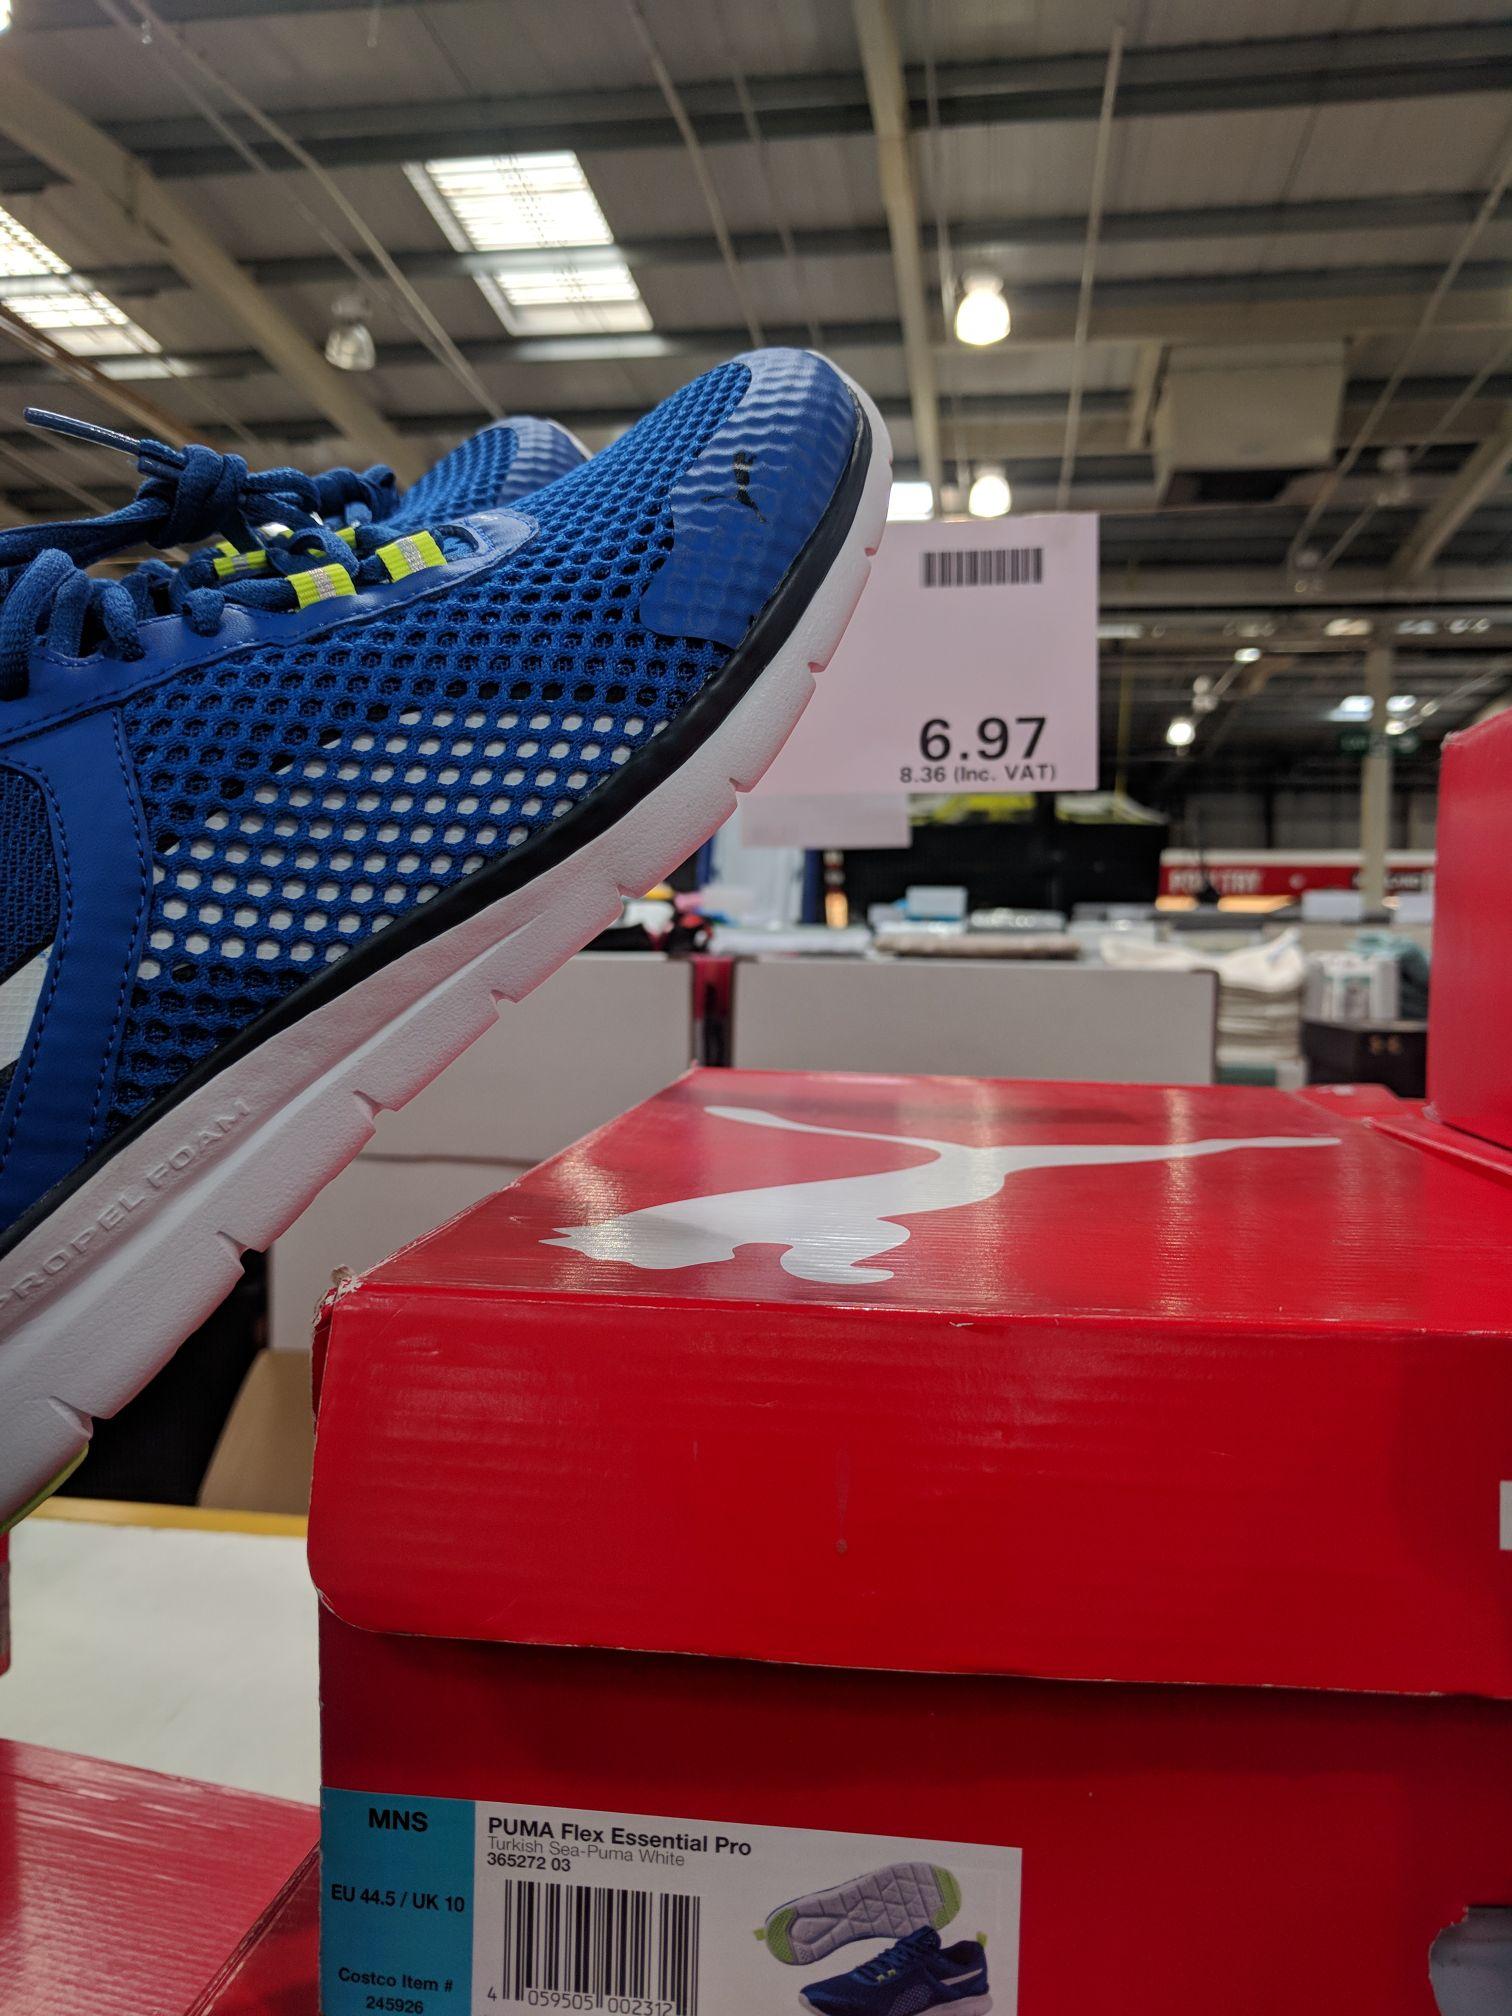 Puma Flex Essential Pro Trainers for £8.36 at Costco instore